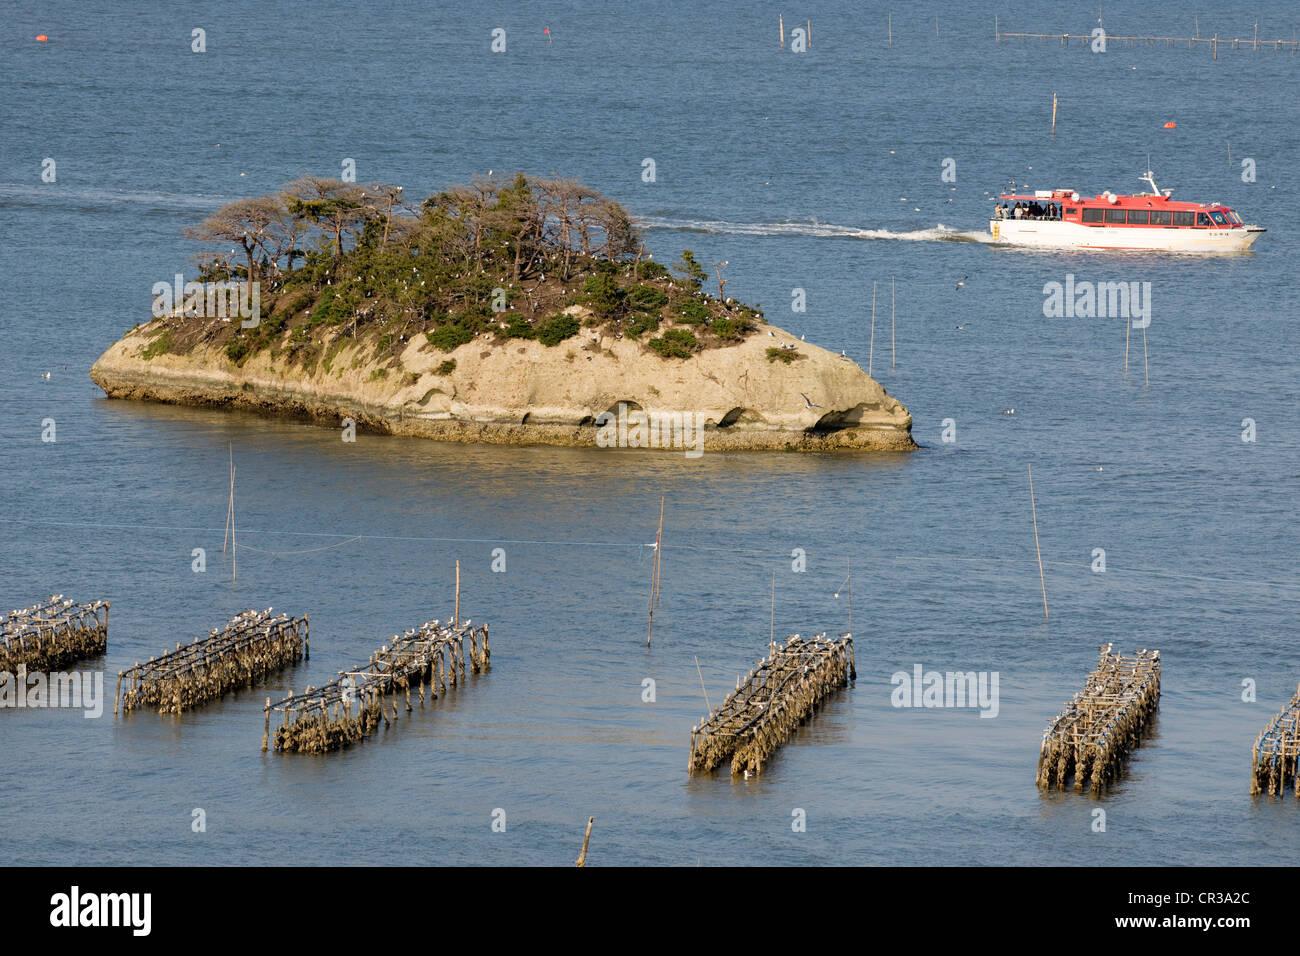 Le Japon, l'île de Honshu, région du Tohoku, Matsushima, la baie Photo Stock